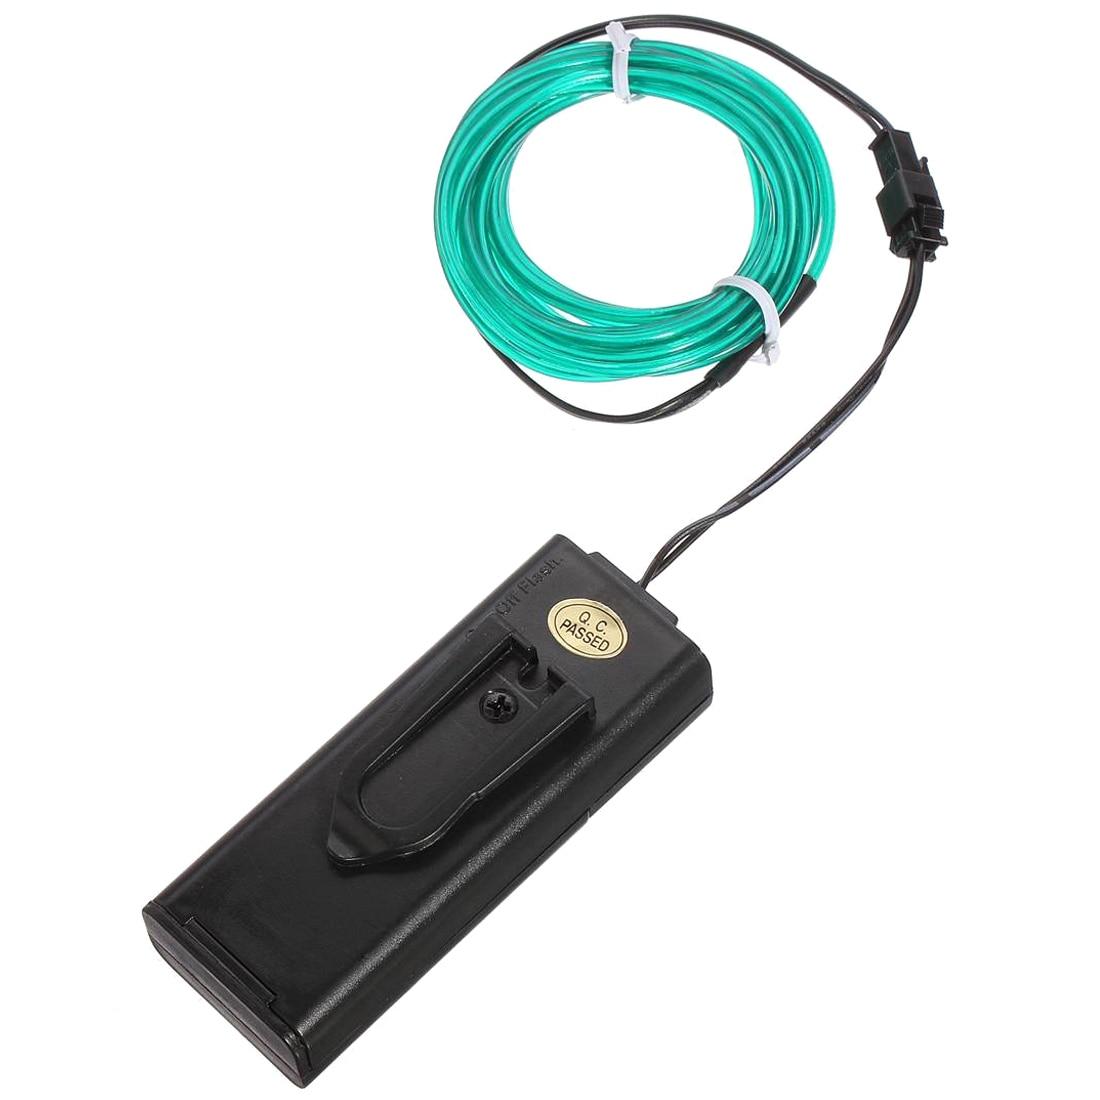 Neon EL Draht 5 Mt Kabel Girlande helle Elektrolumineszenz (EL Draht ...